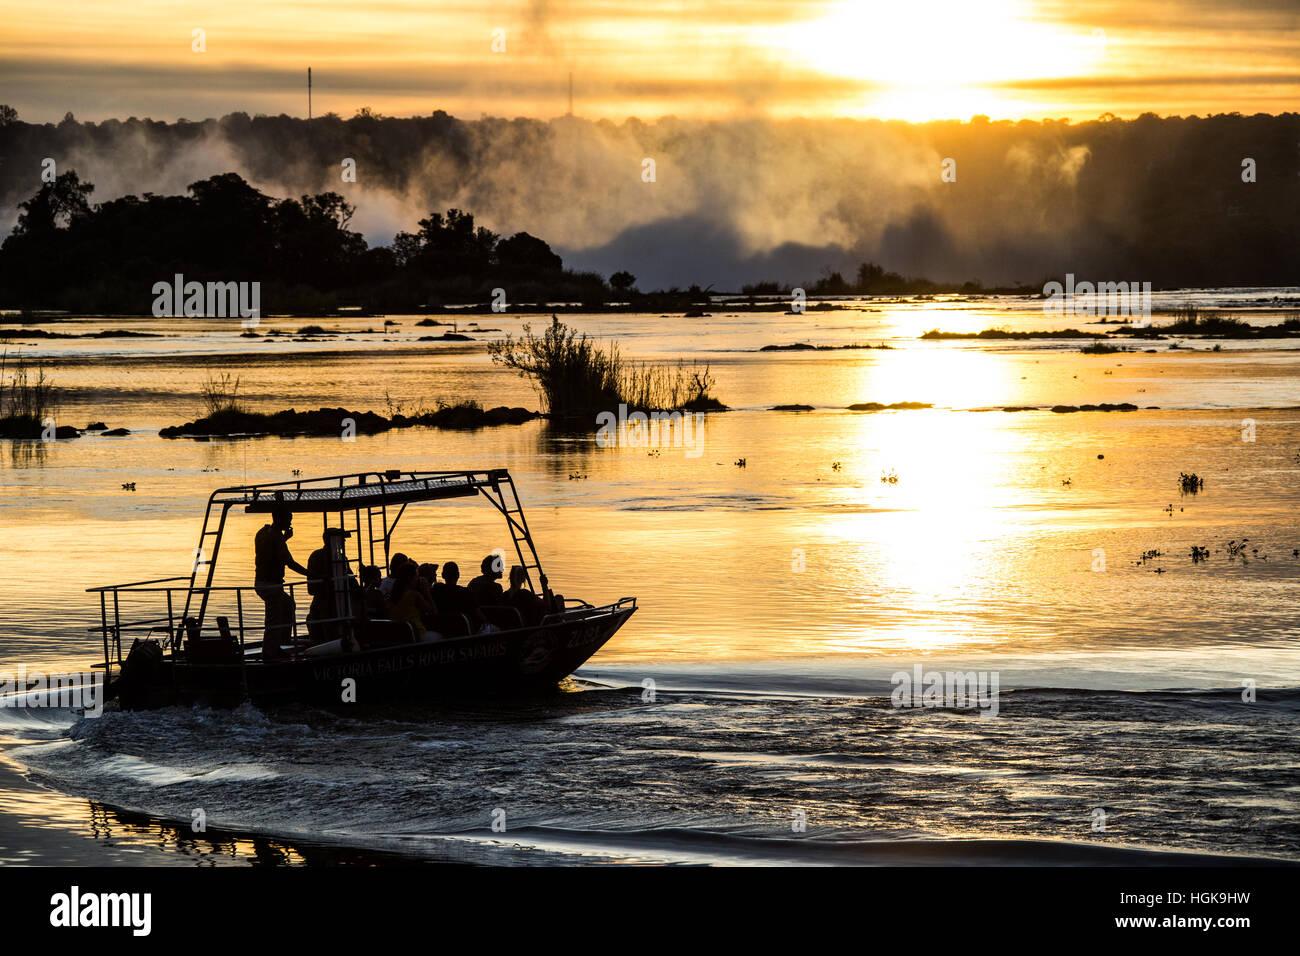 Sunset boat ride above Victoria Falls, Livingstone, Zambia - Stock Image